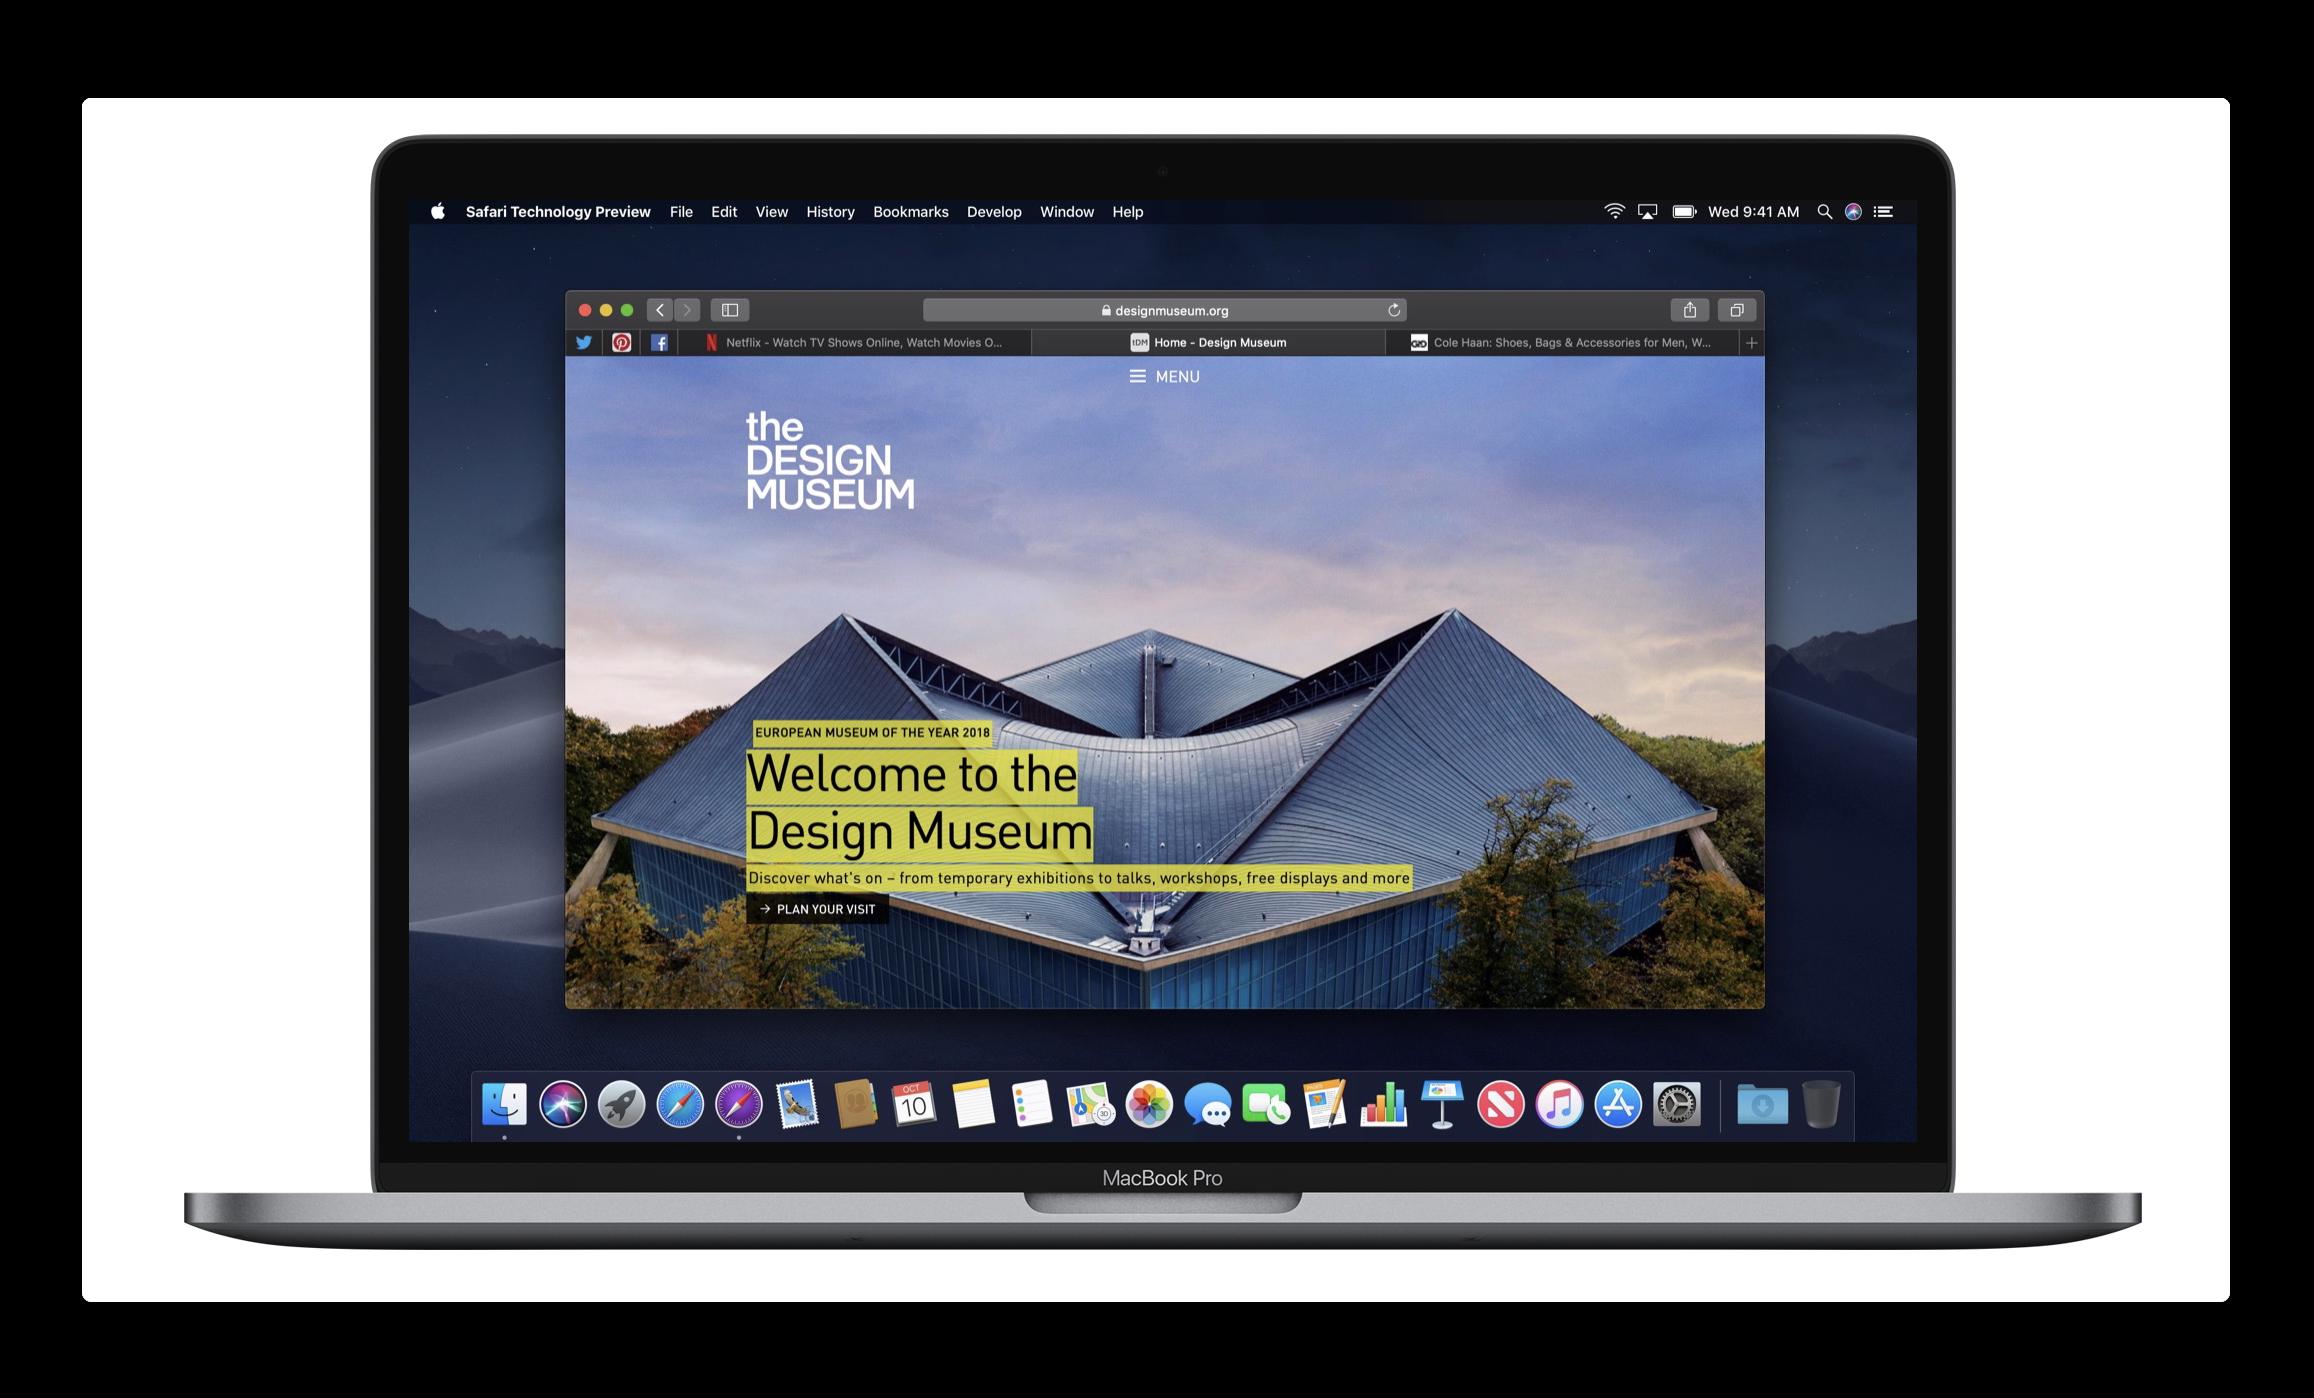 【Mac】Apple,「Safari Technology Preview Release 75」を開発者にリリース